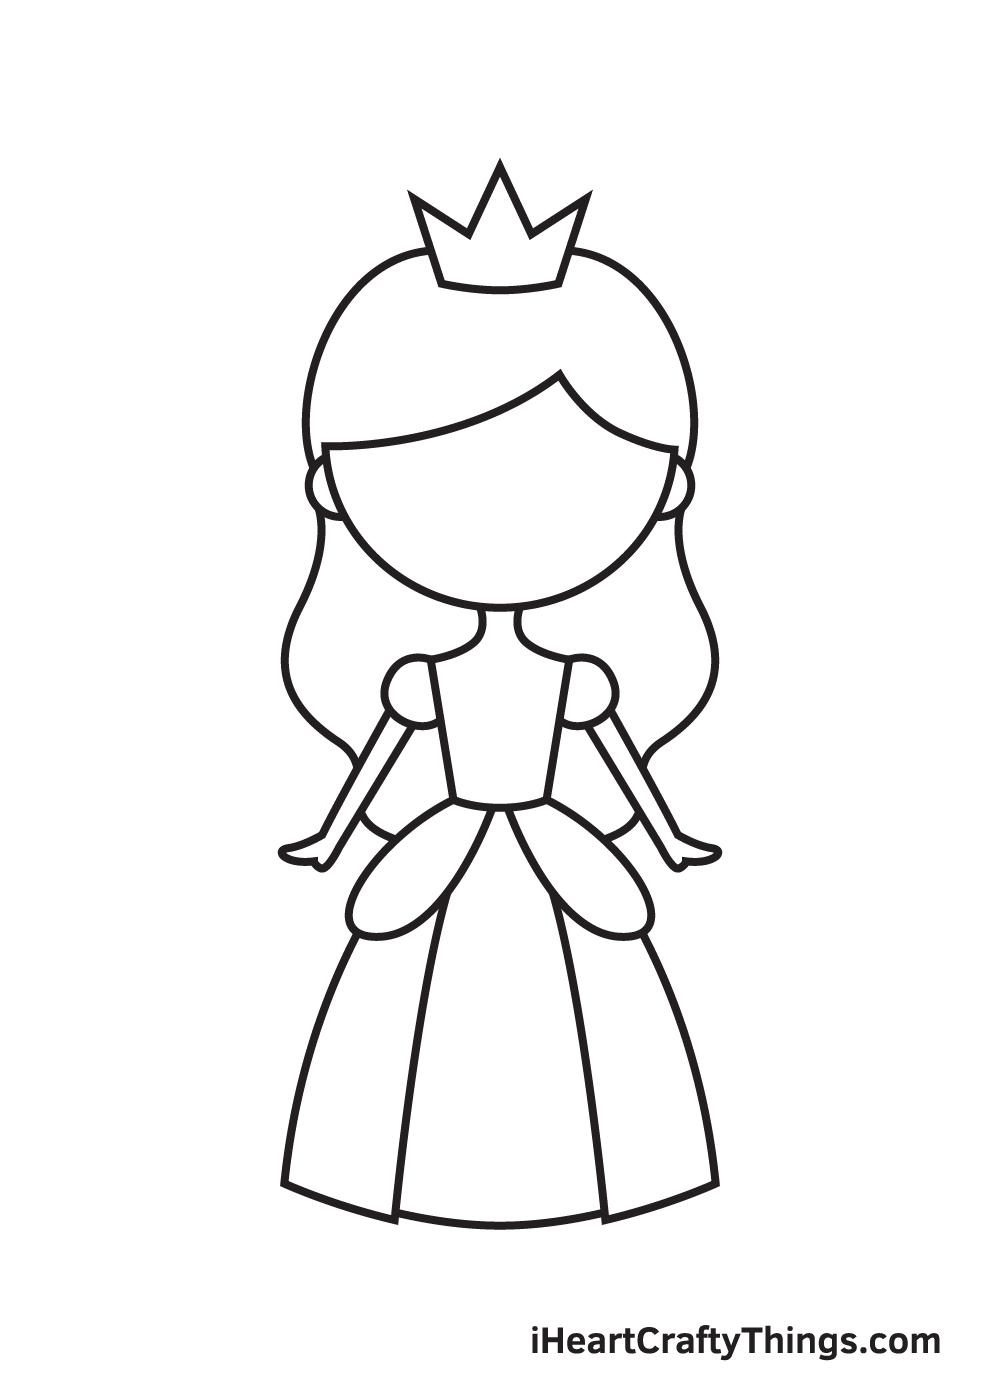 Princess Drawing – Step 7